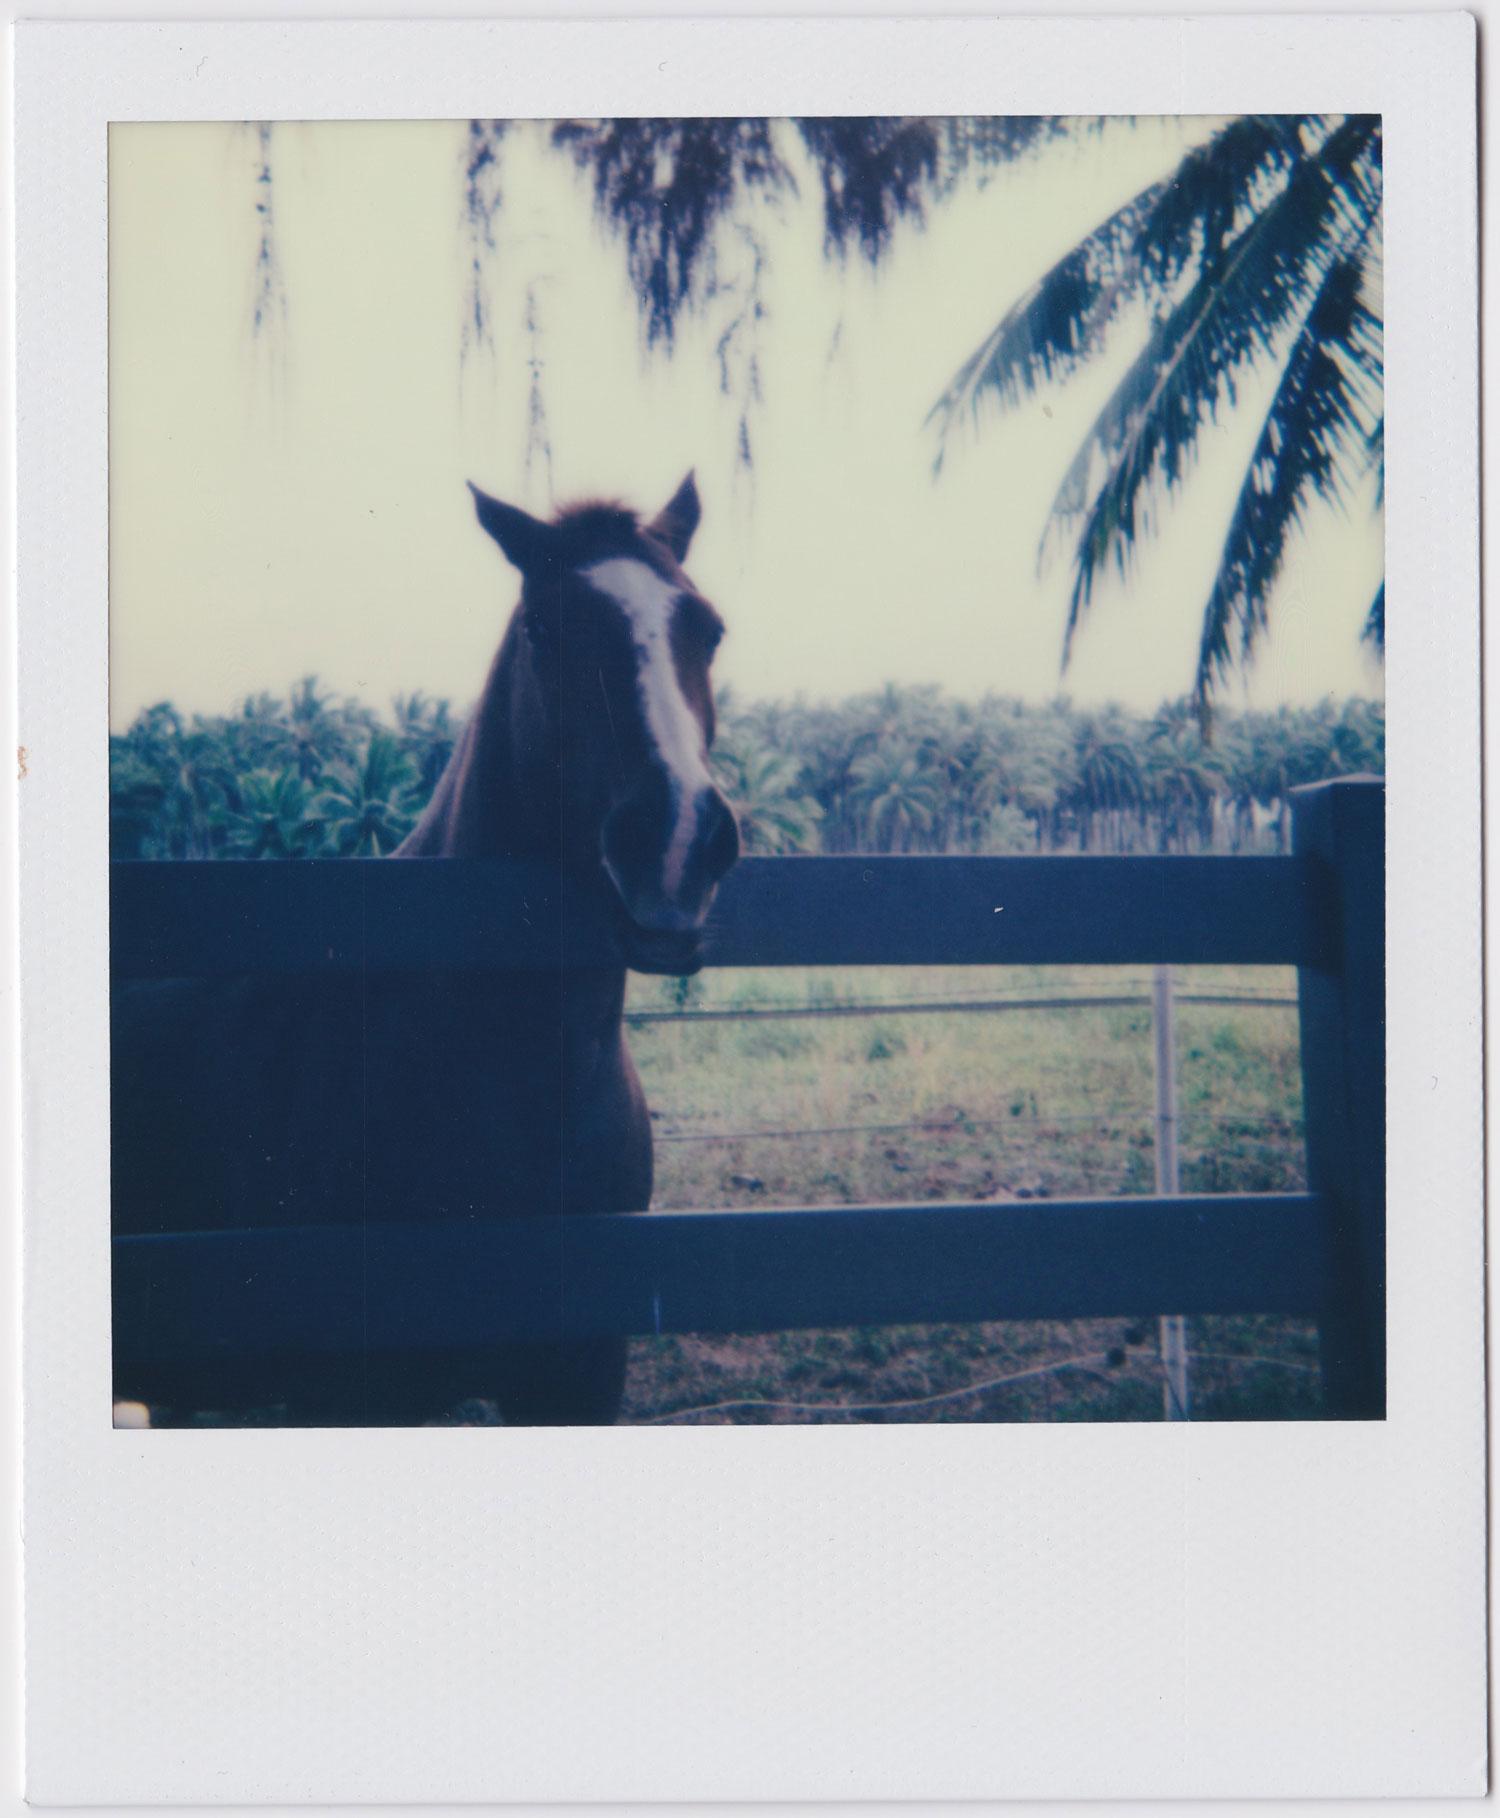 whoiscx_christina_choi_photography_polaroid_film_hawaii_horse_9.jpg